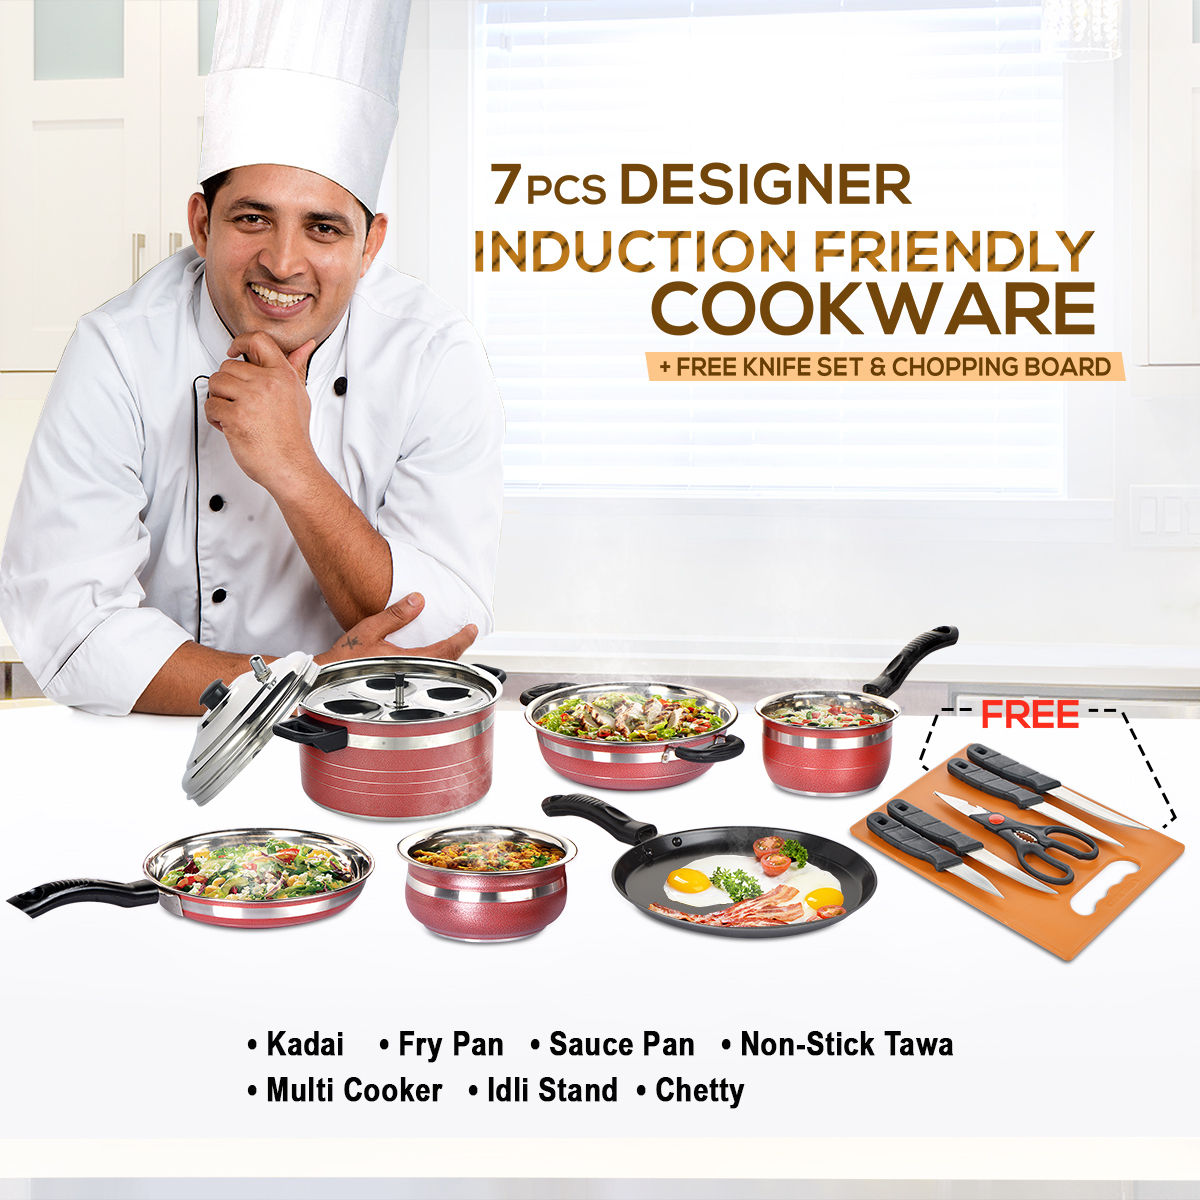 Buy 7 Pcs Designer Induction Friendly Cookware Set Free Knife Set